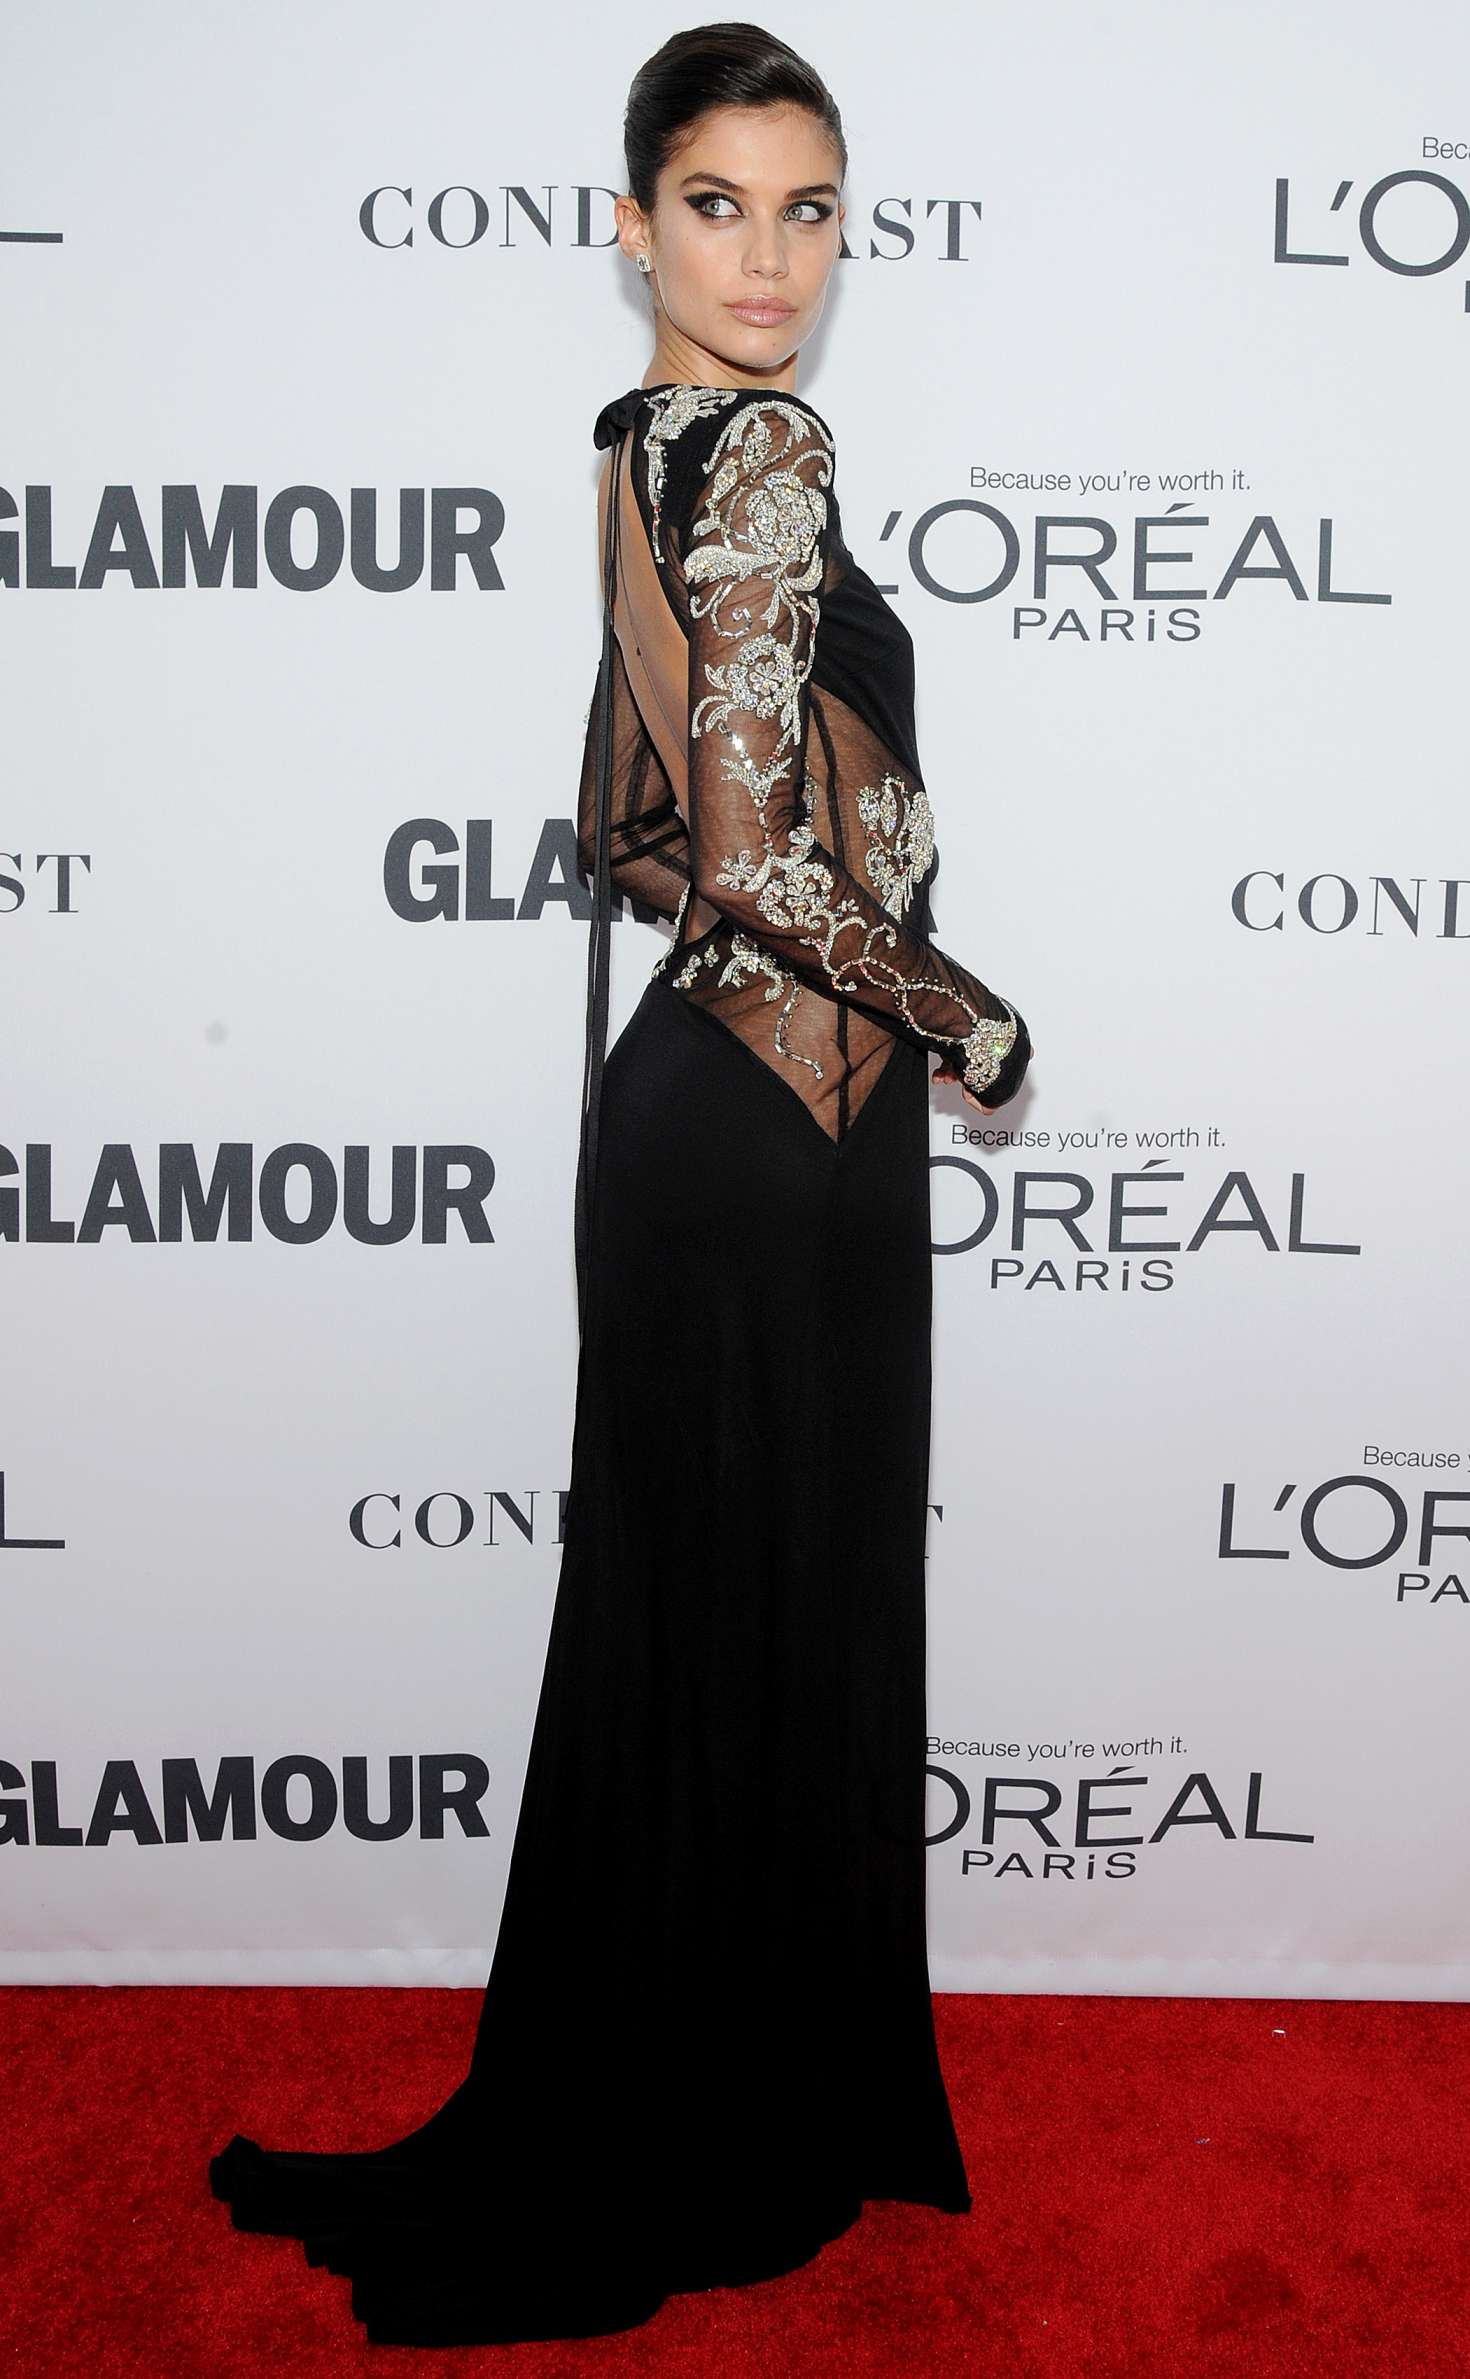 Sara Sampaio 2017 : Sara Sampaio: 2017 Glamour Women of The Year Awards -02